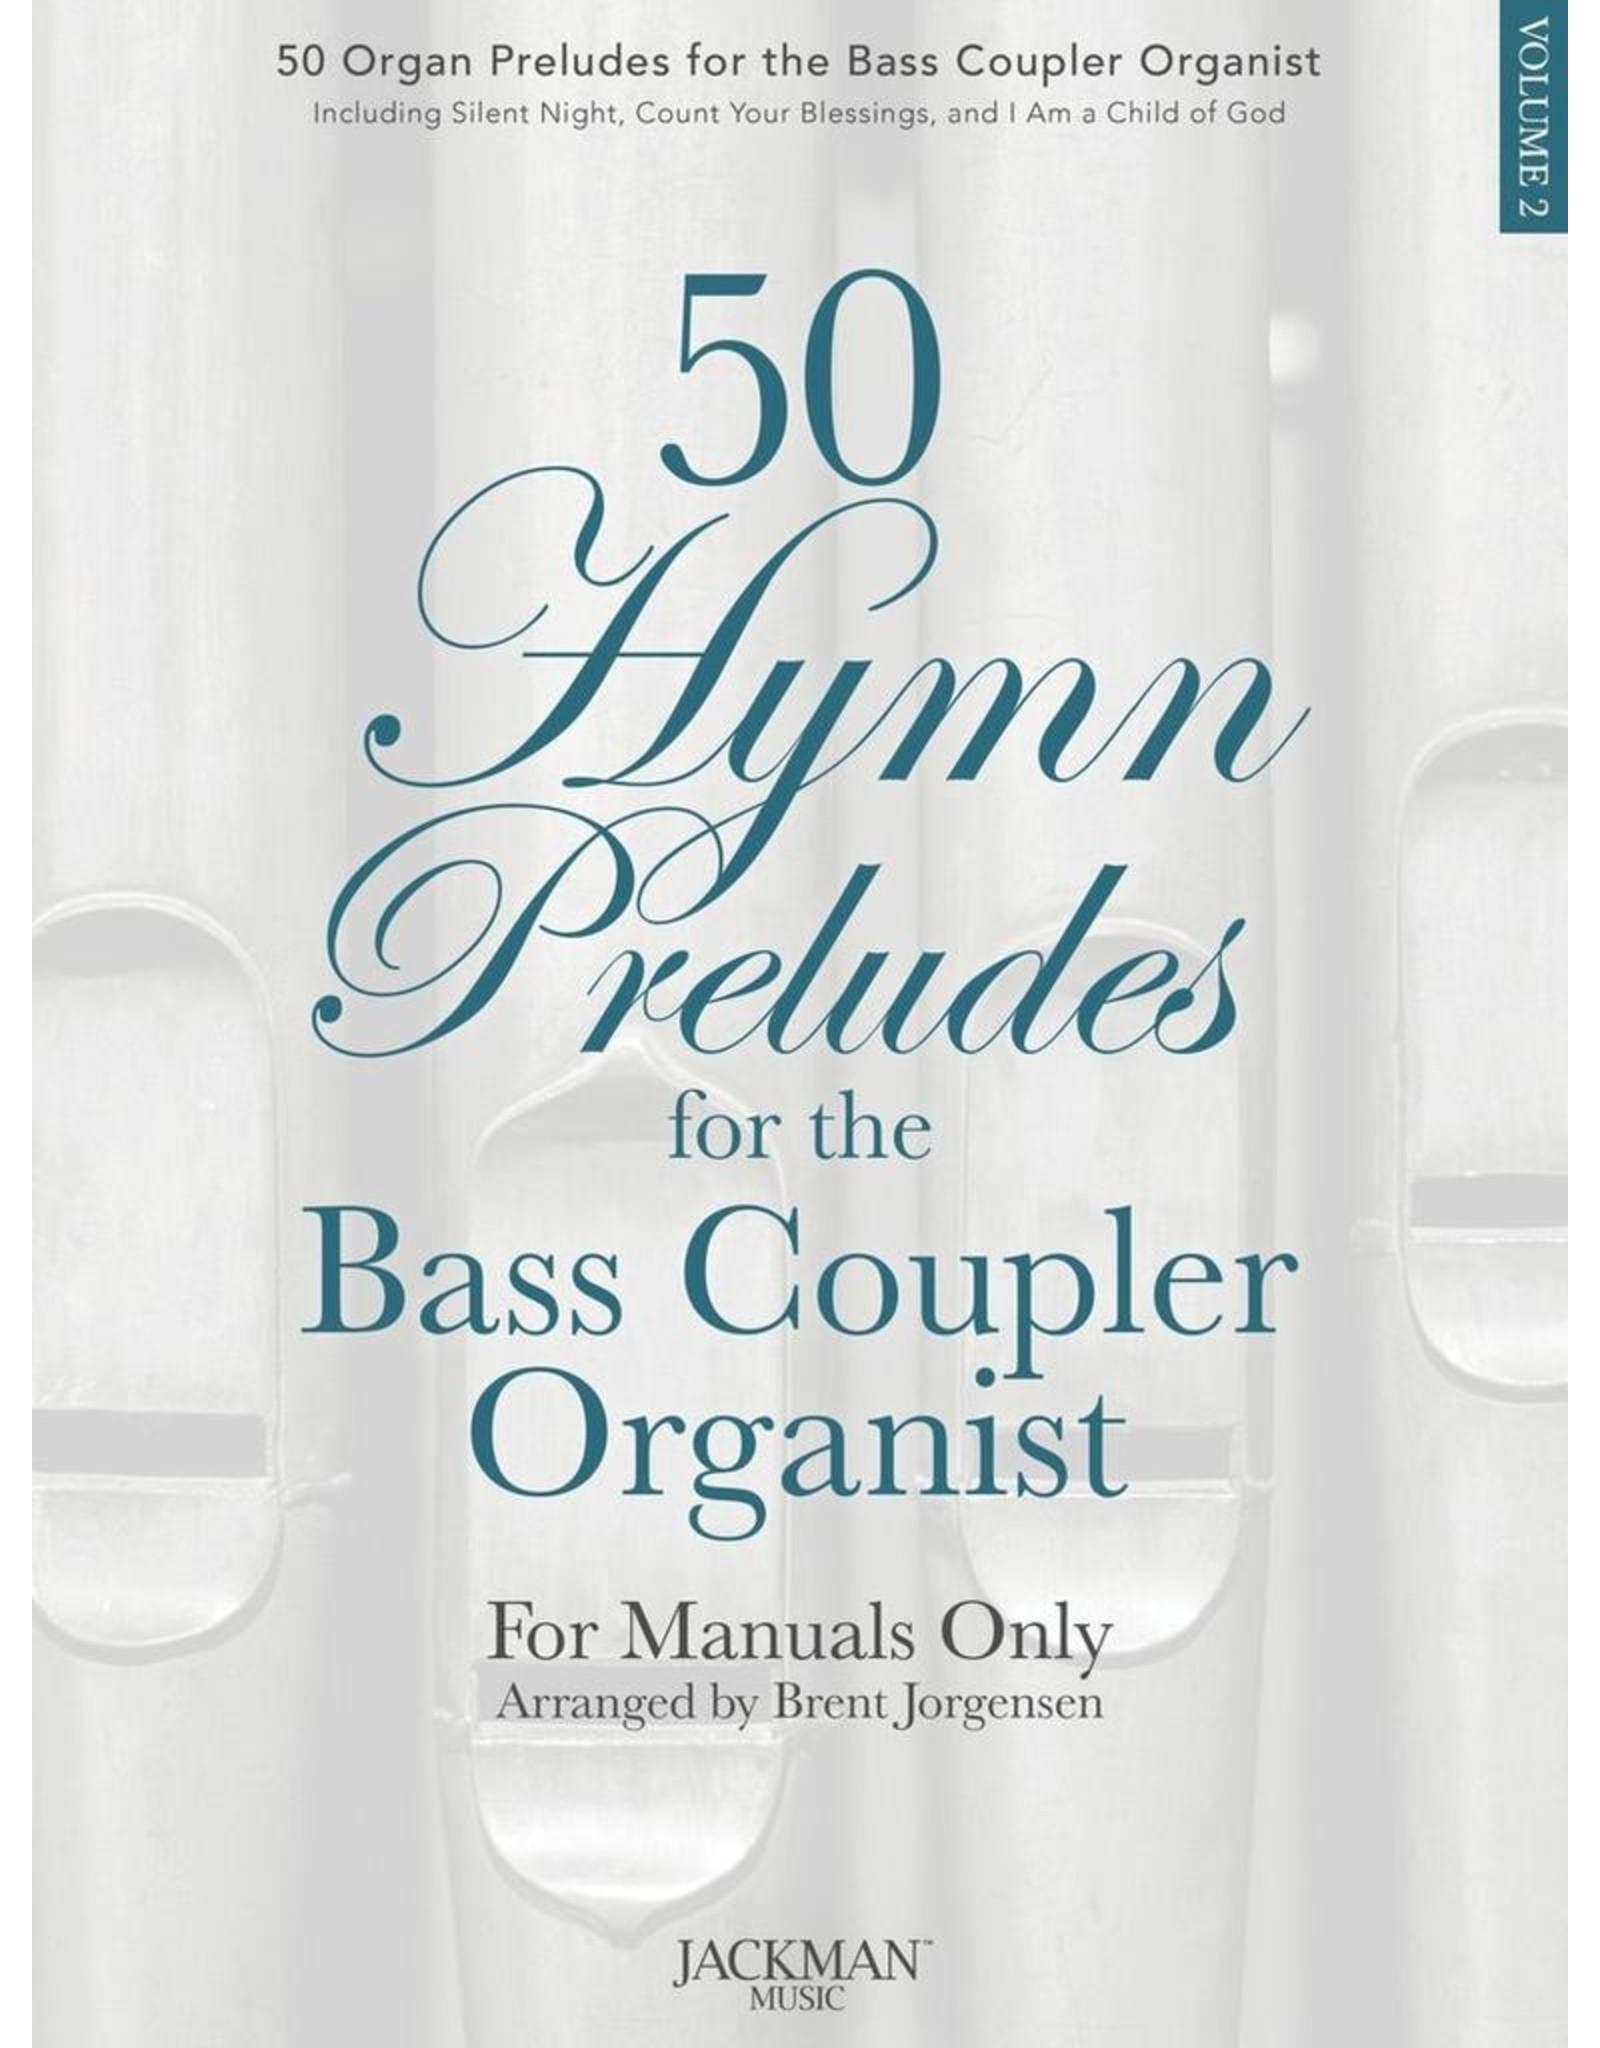 Jackman Music 50 Hymn Preludes for the Bass Coupler Organist Volume 2 arr. Brent Jorgensen